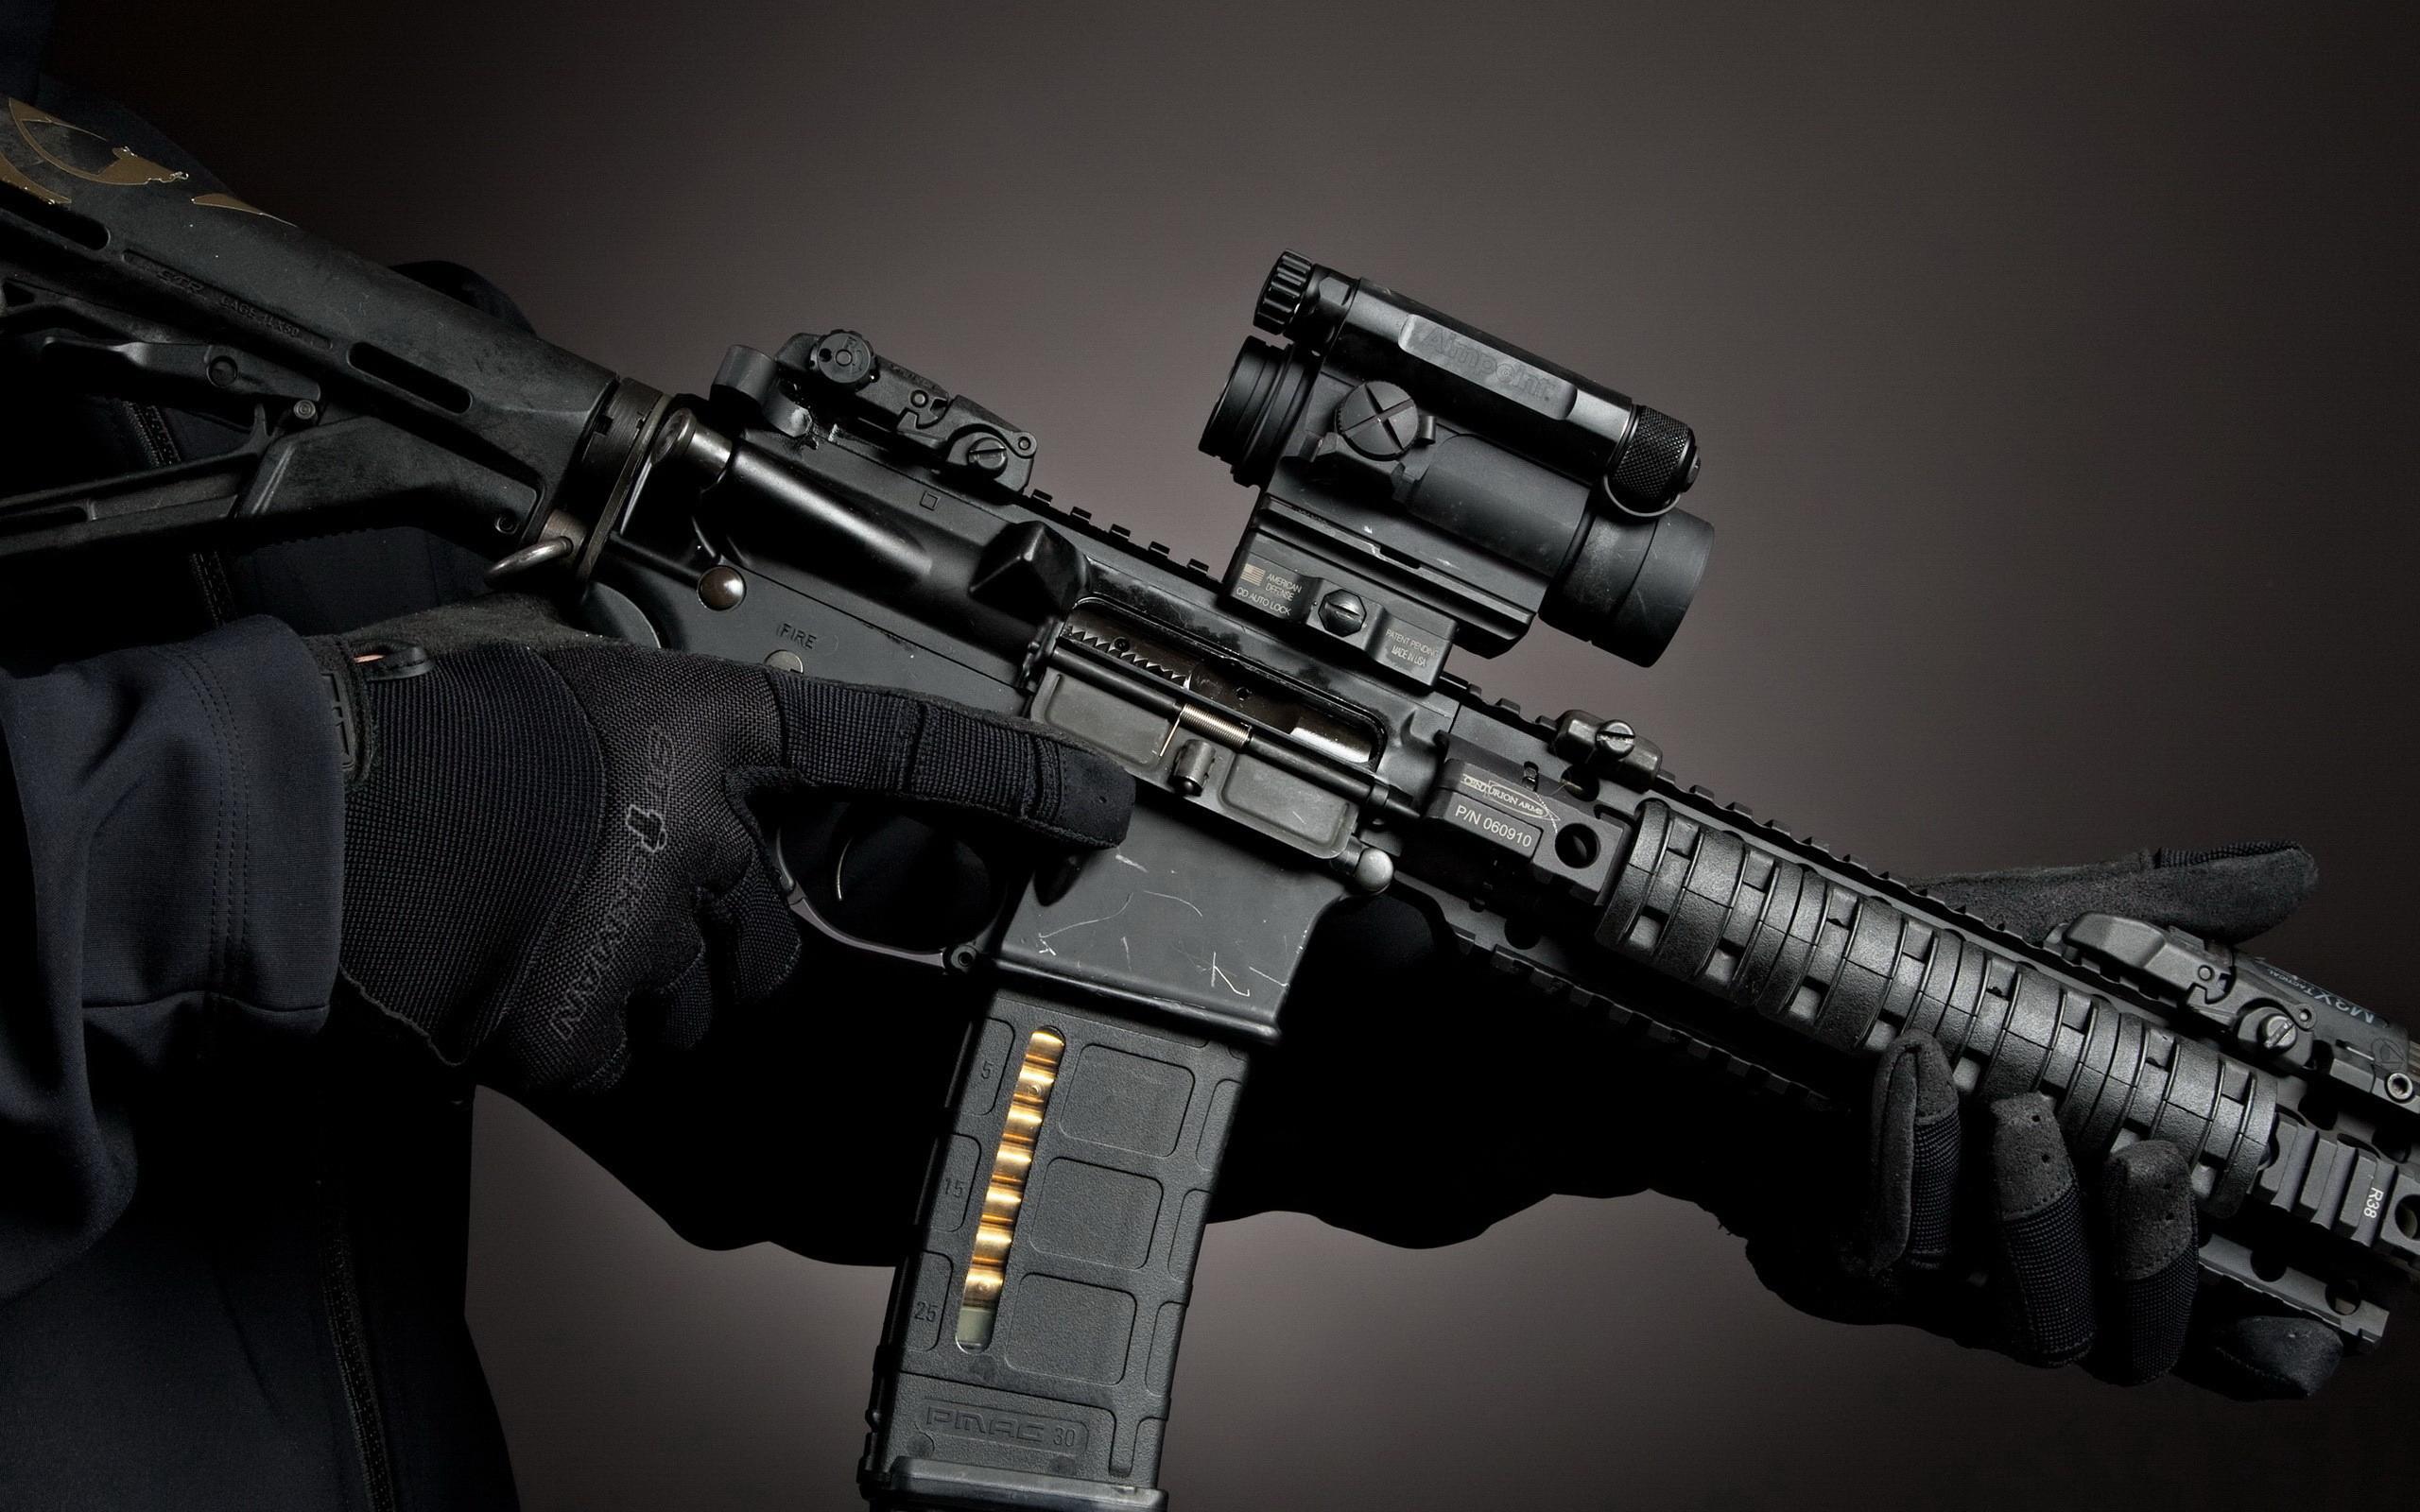 Best 50 Rifle Wallpaper on HipWallpaper Peonies Wallpaper Rifle 2560x1600